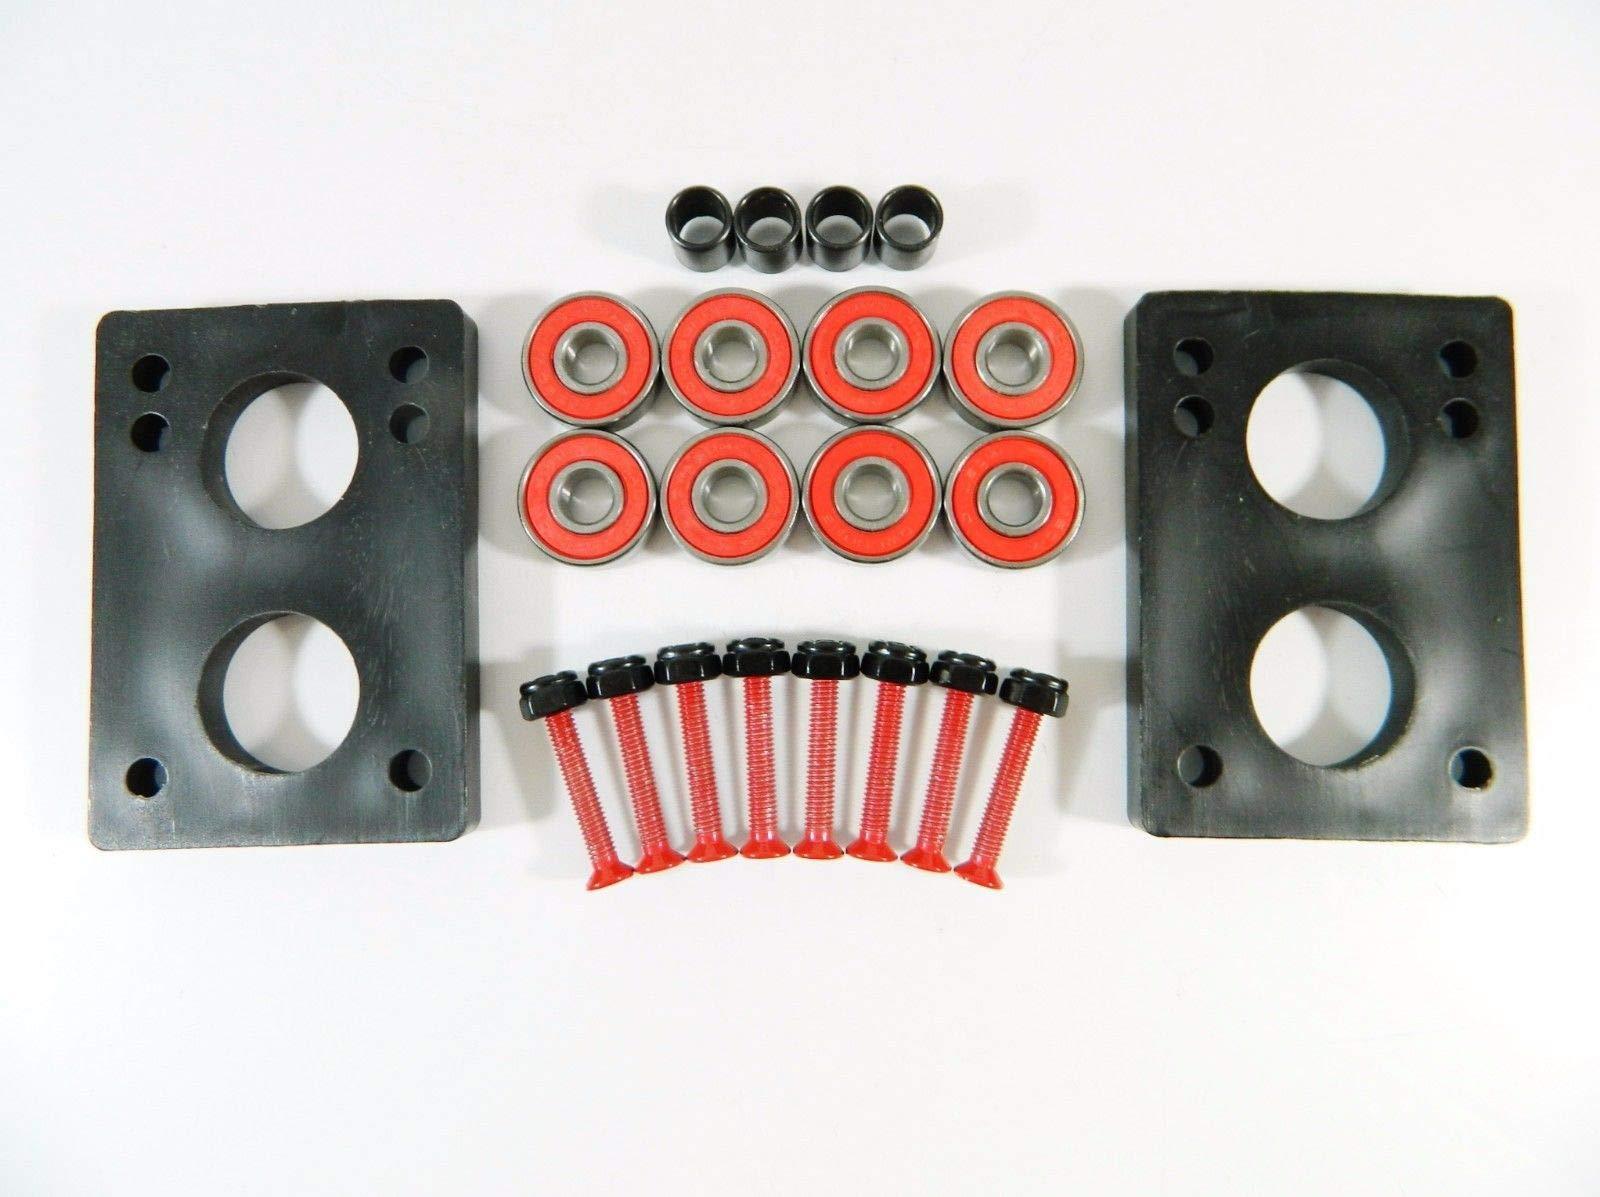 Good Skateboard Red ABEC 7 Precision Bearings + 1.25'' Color Hardware + 1/4'' Riser Pads